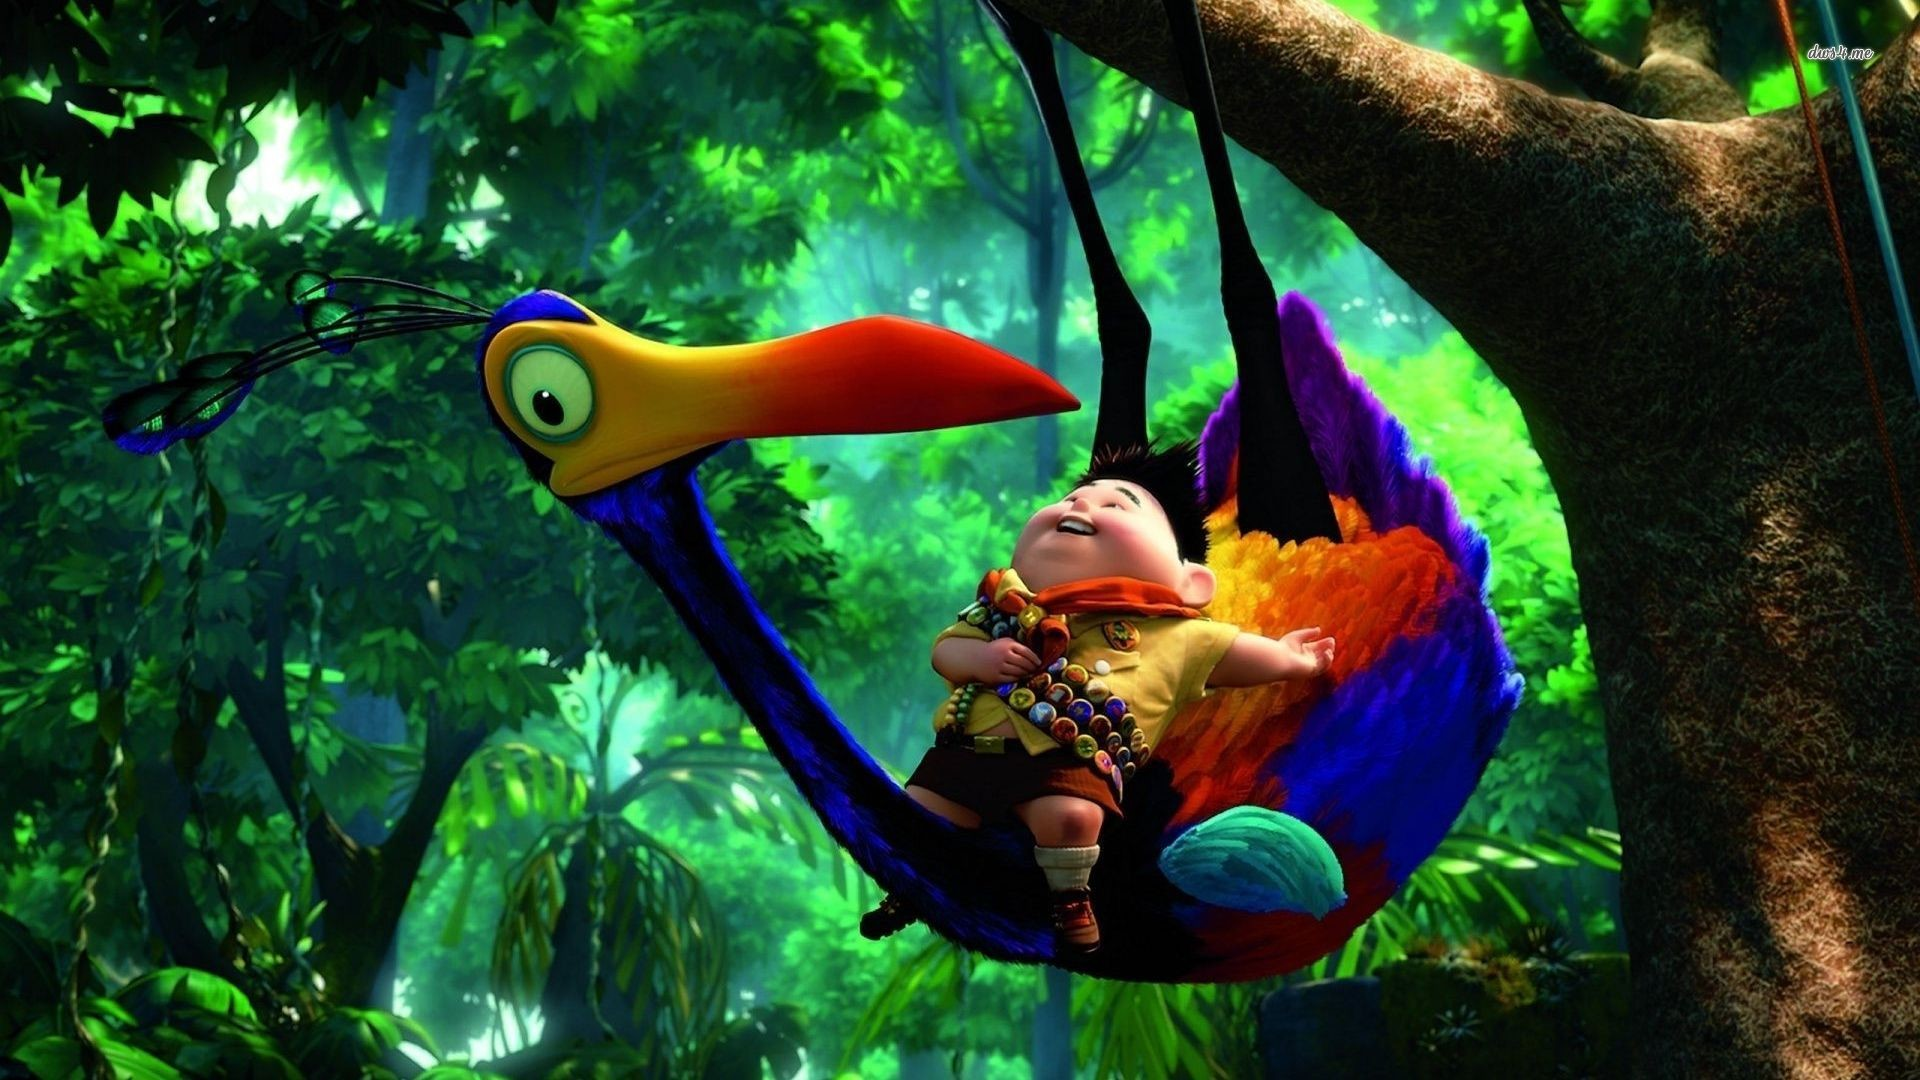 Bird Of Paradise Wallpaper Iphone 5 Up Wallpaper Pixar 183 ① Wallpapertag